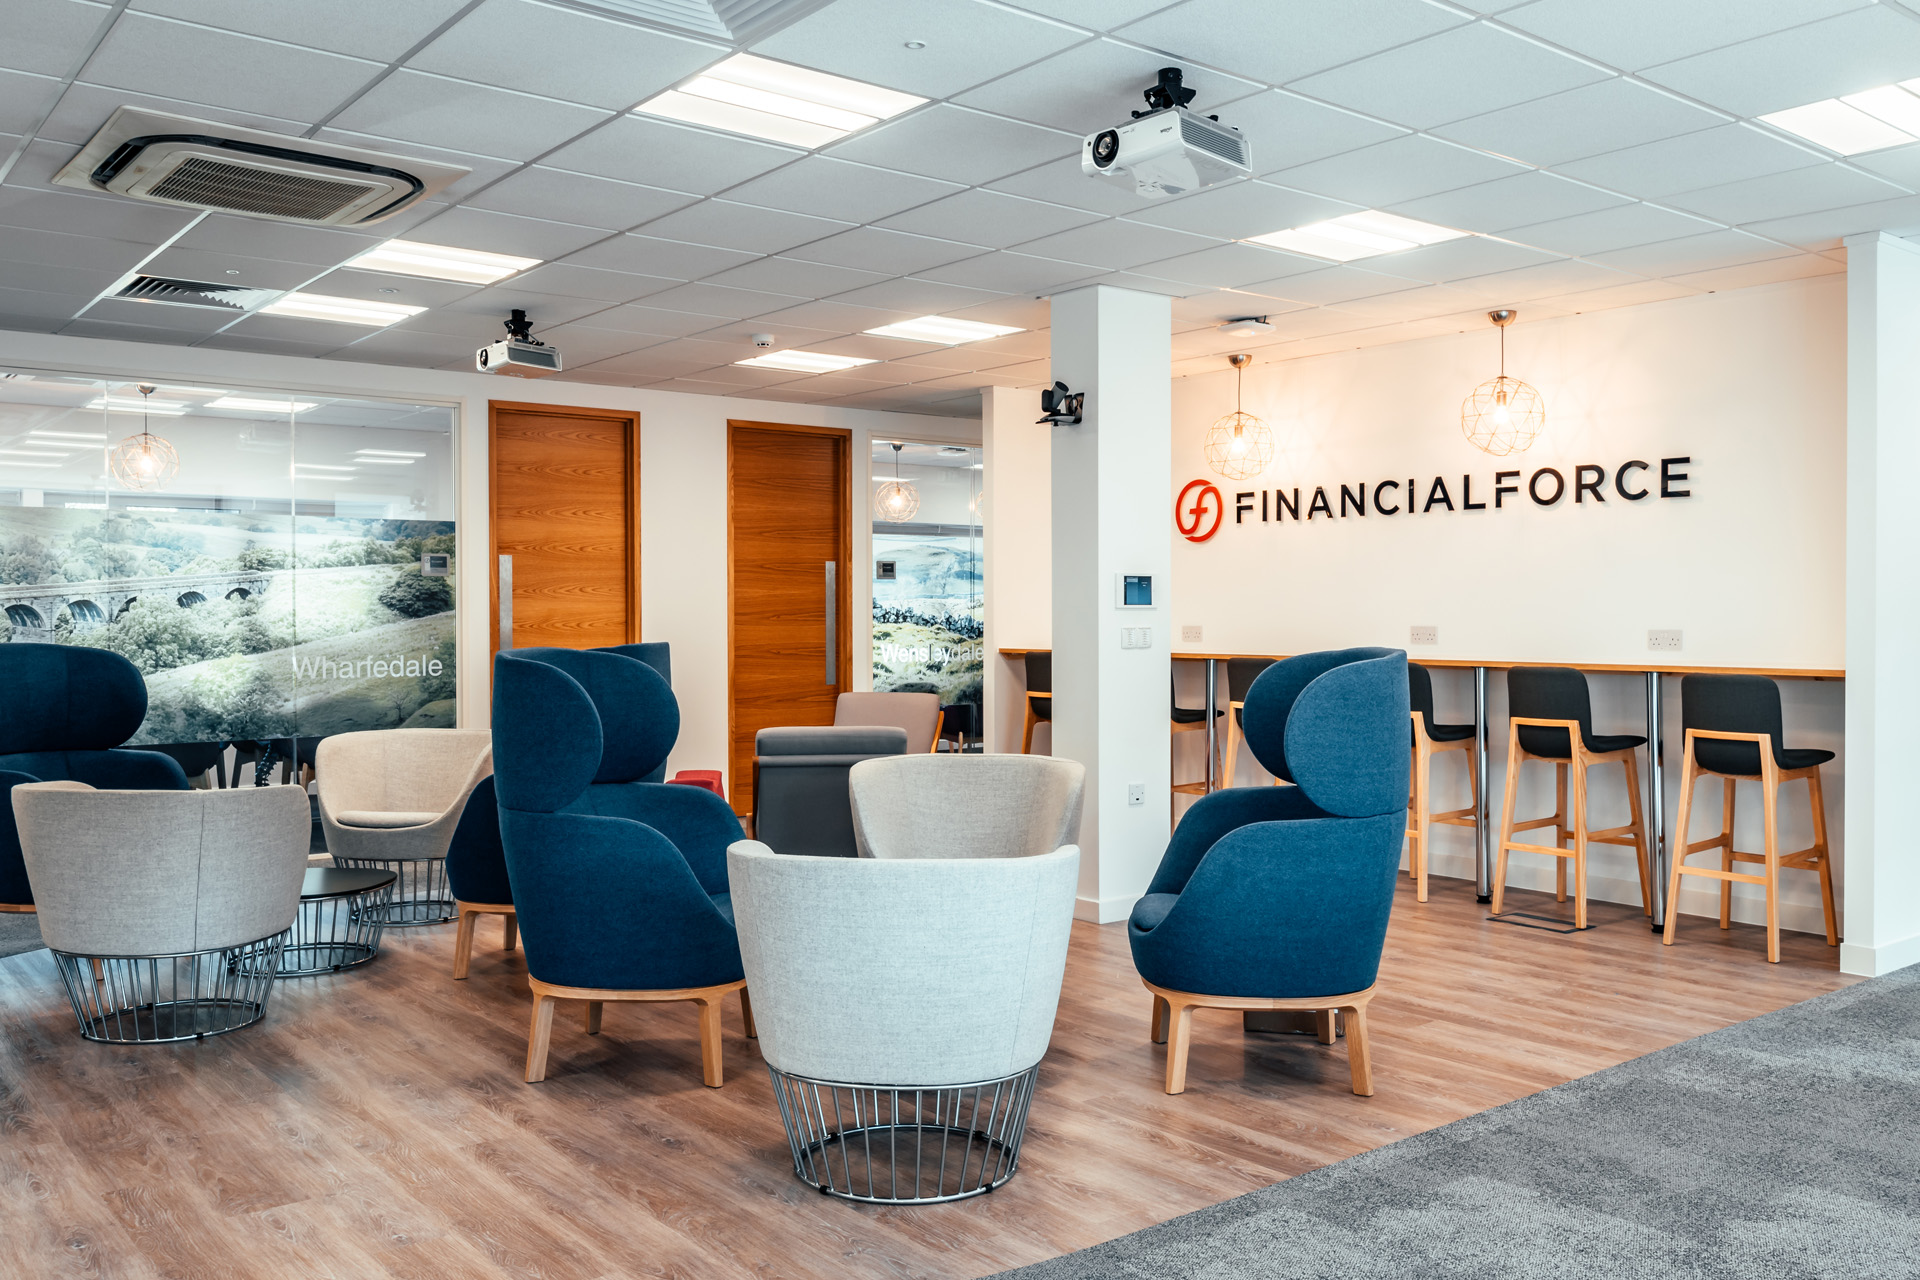 Financial-Force-2018-06-29-2.jpg